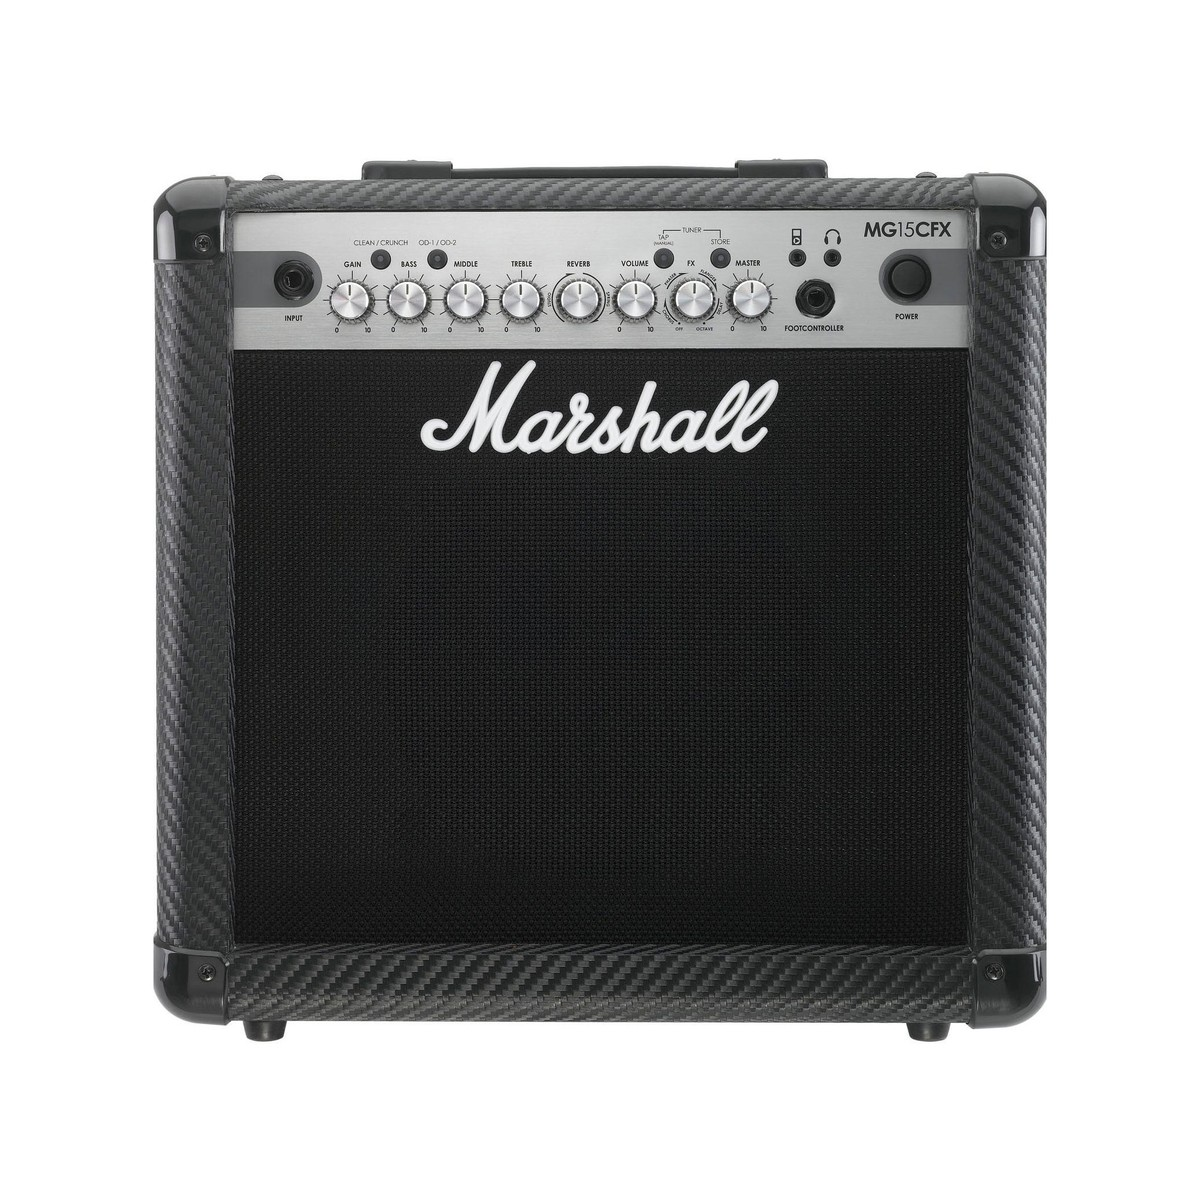 Marshall Mg15cfx Fibra De Carbono Combo Guitarra 15w Conmmutable  # Muebles Fibra De Carbono